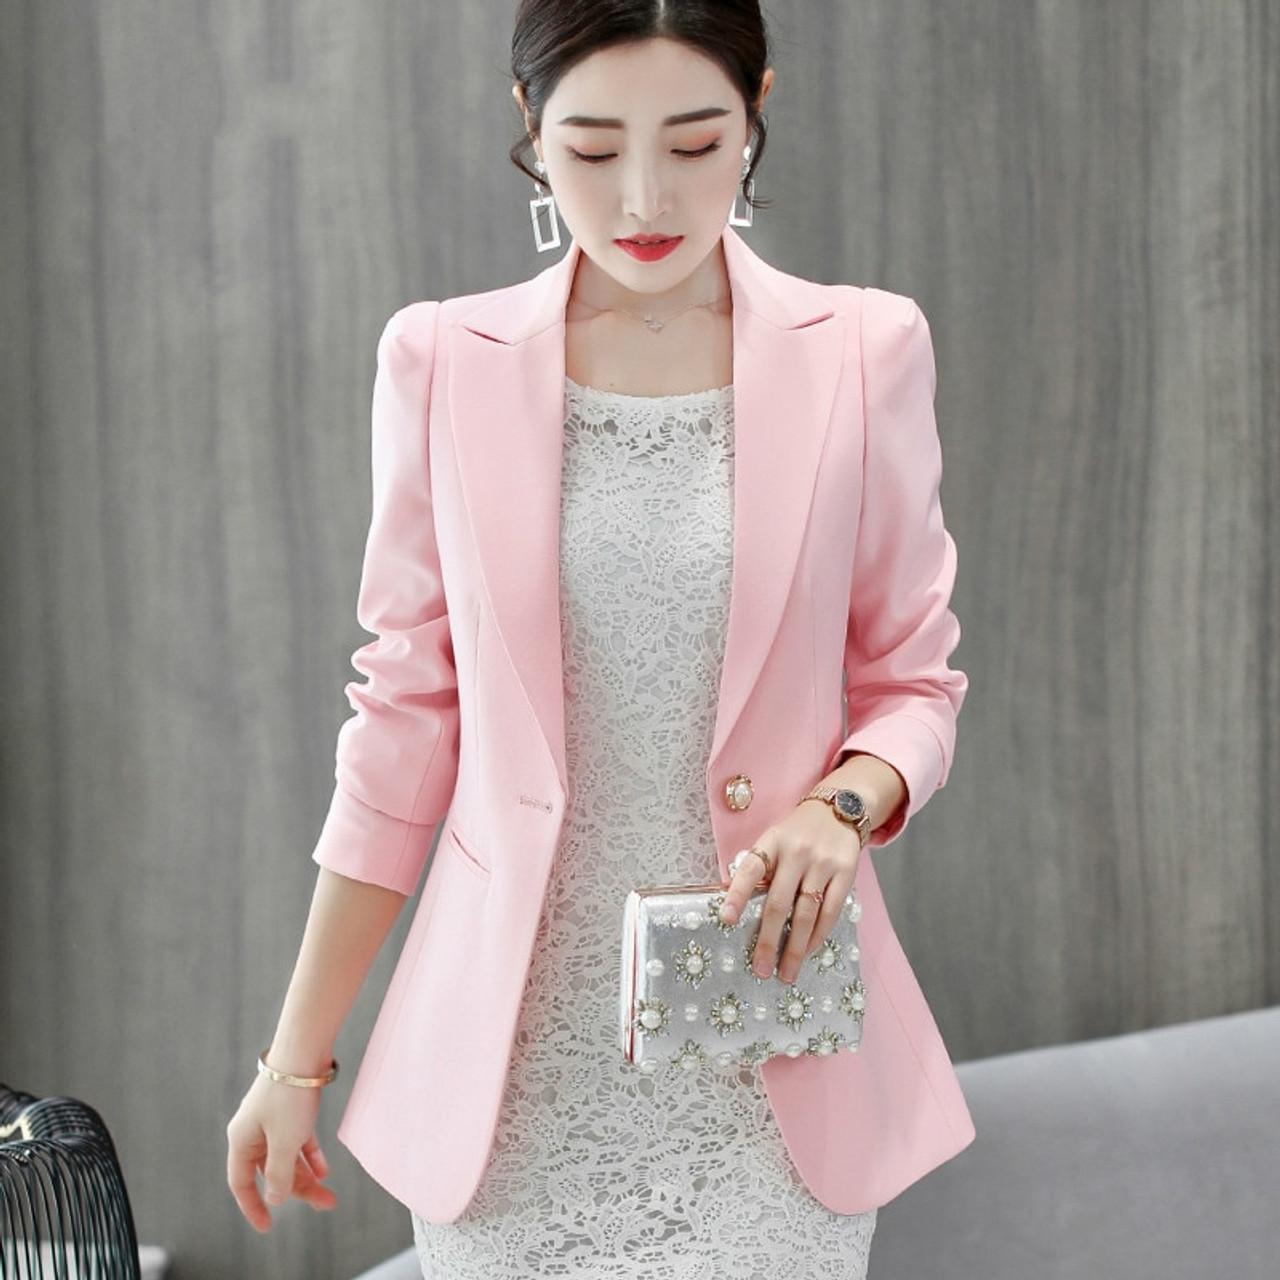 00ef21e1463 PEONFLY New Solid Color Black Simple Women Blazers Suit Slim Jacket Work  Wear Office Female Elegant ...